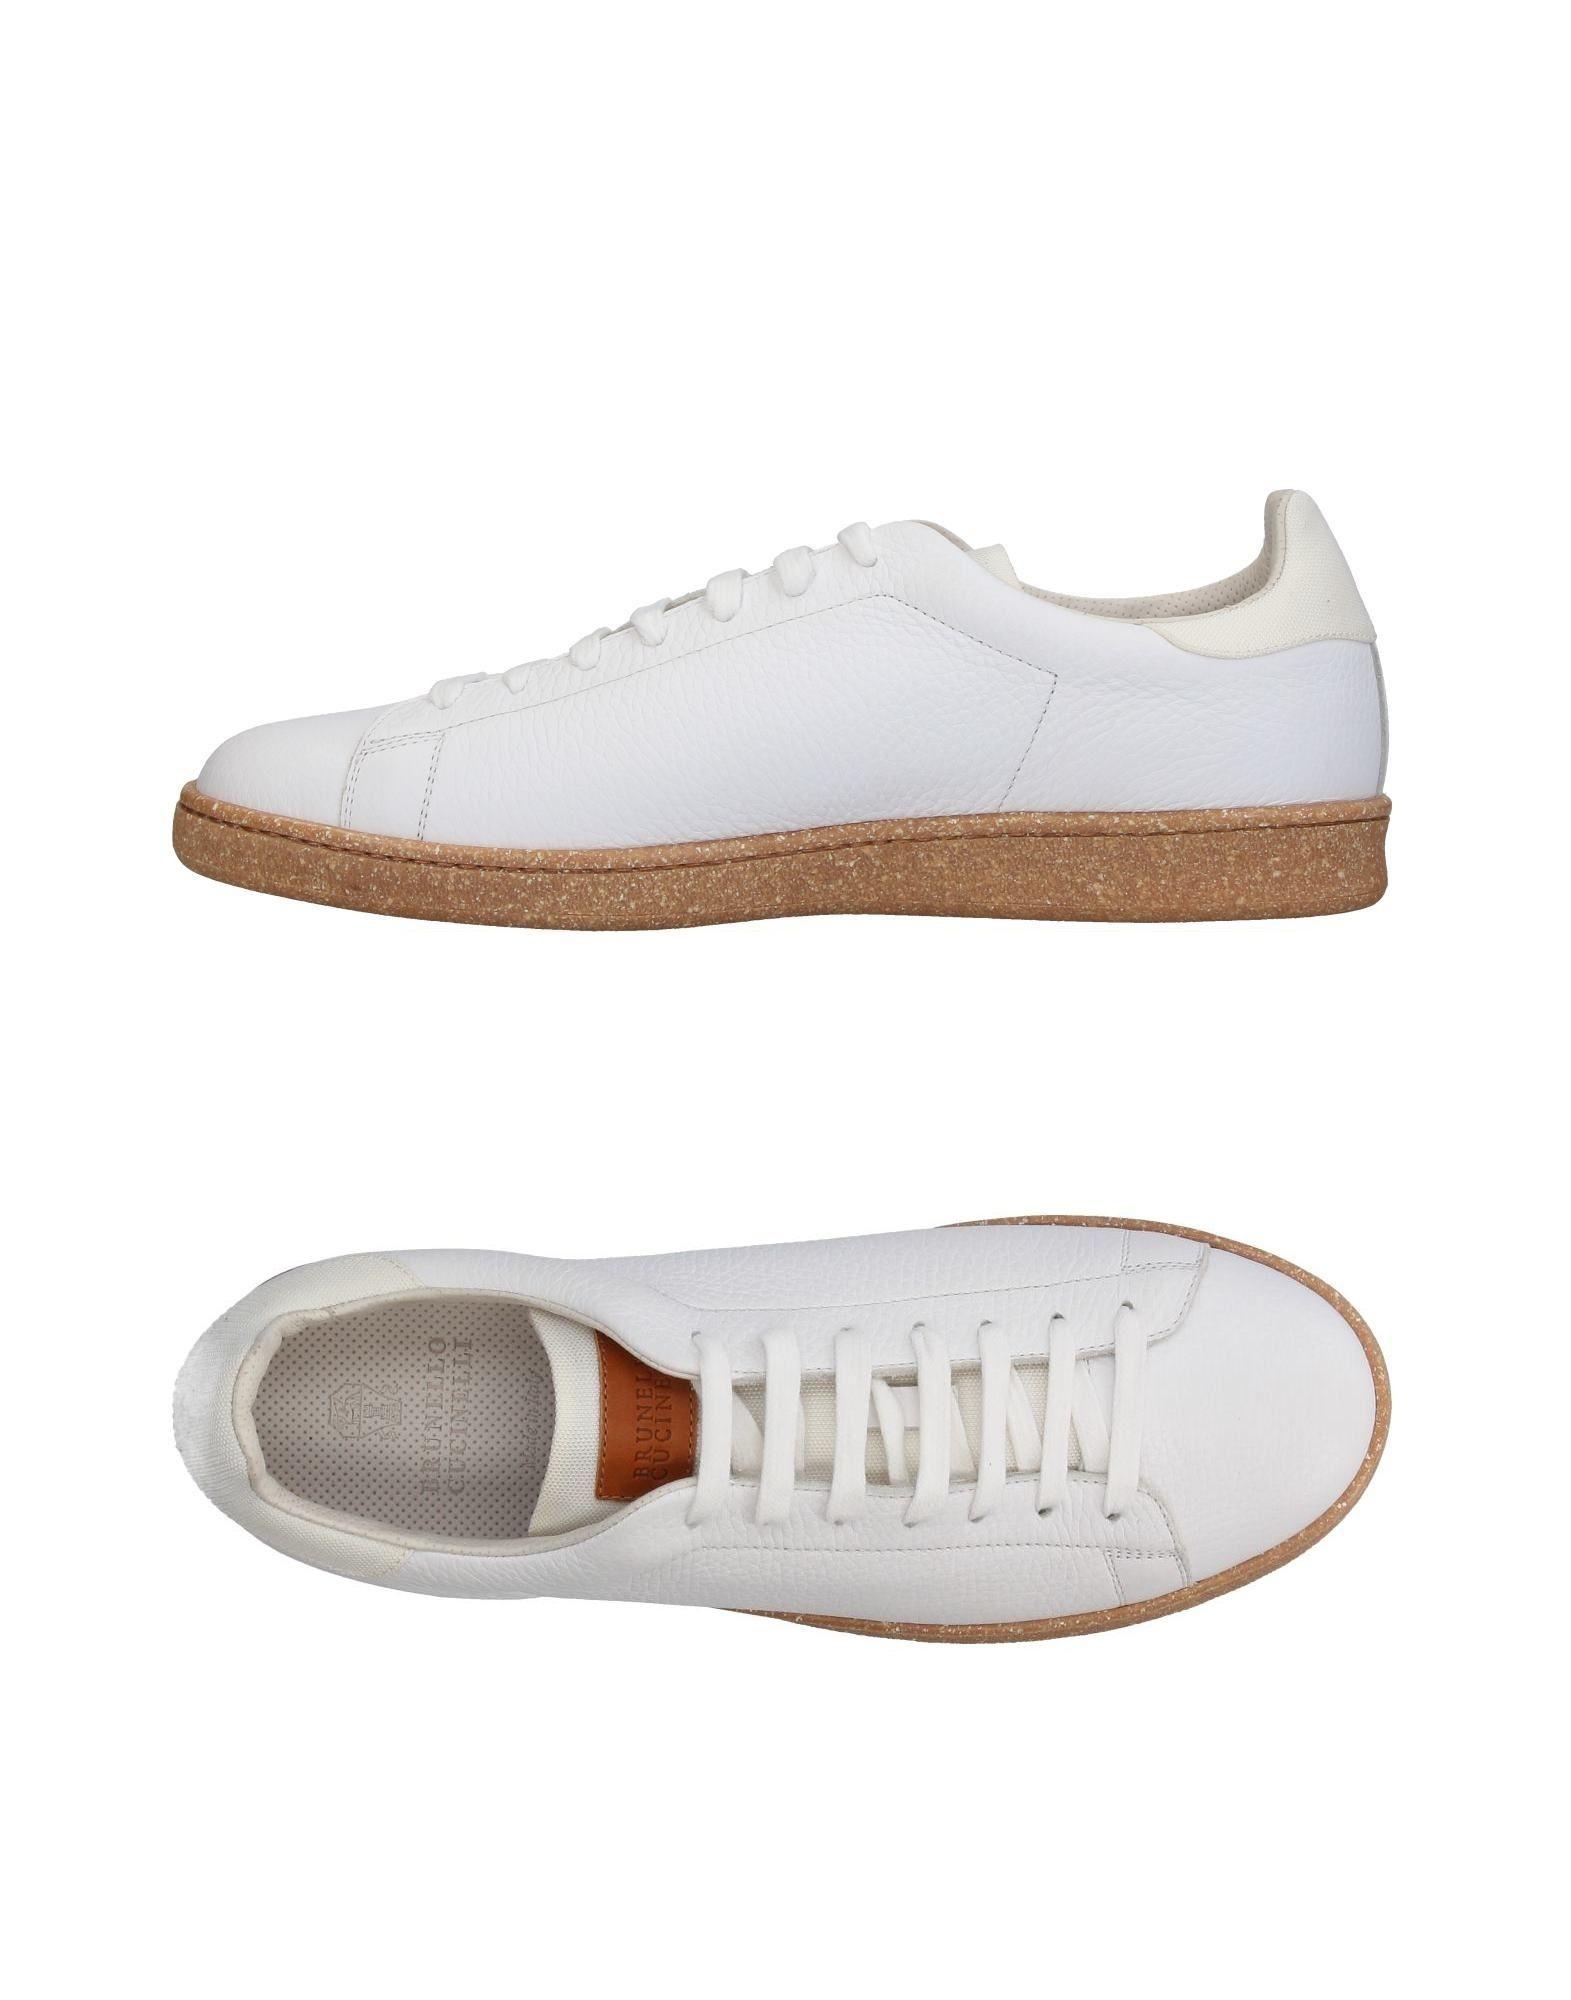 Brunello Cucinelli Sneakers Herren  11397094JE Gute Qualität beliebte Schuhe